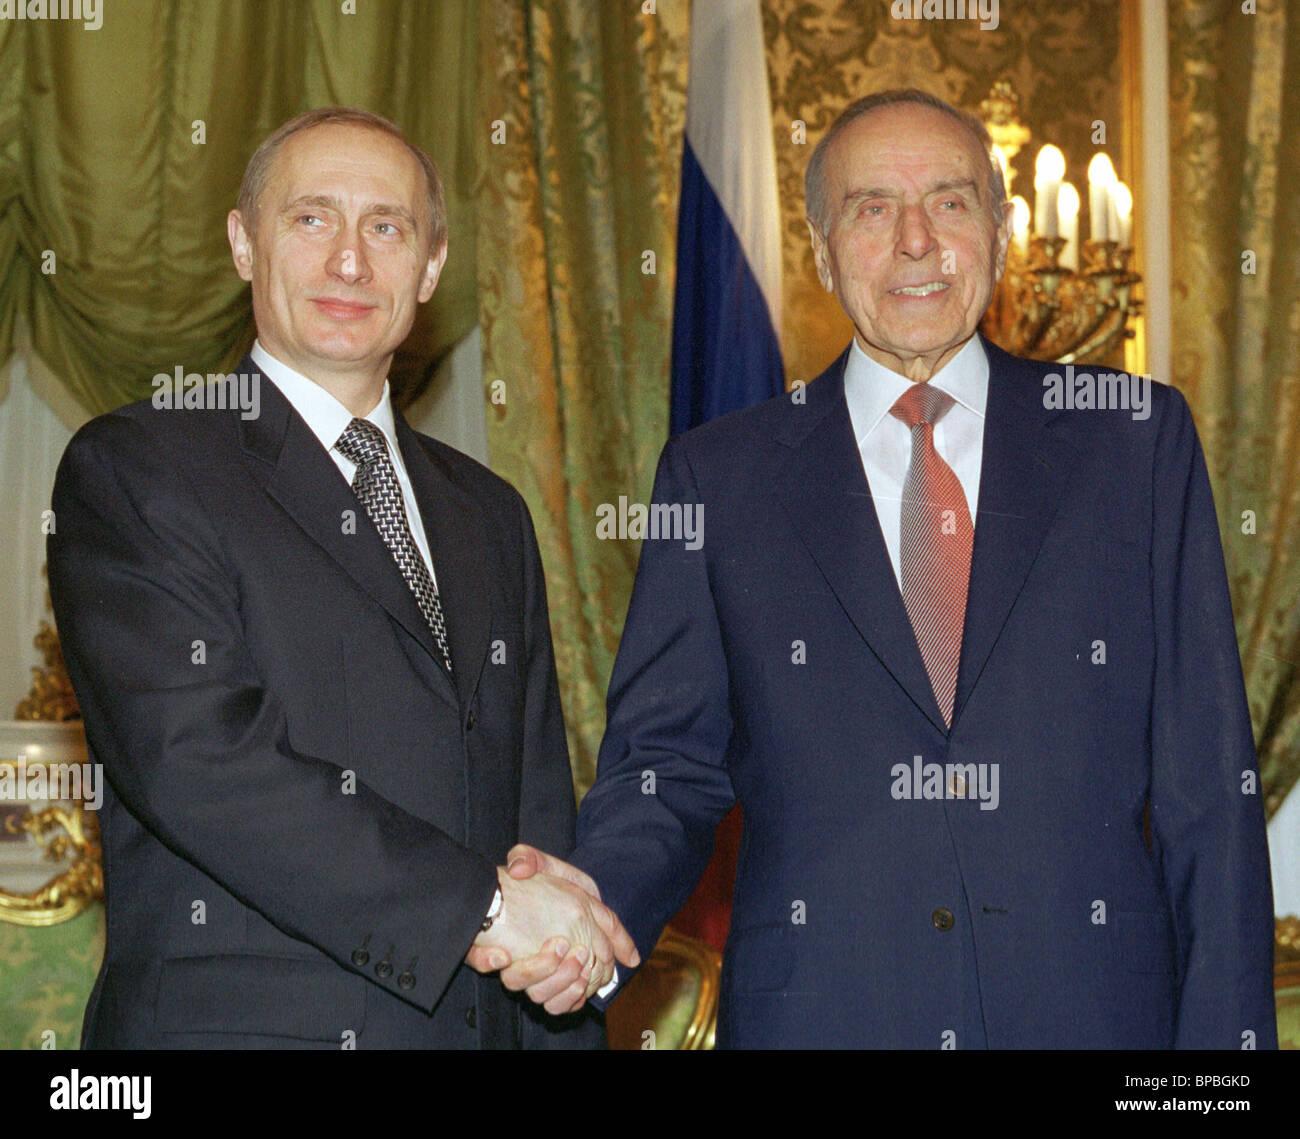 Russia, Azerbaijan presidents meet for talks - Stock Image